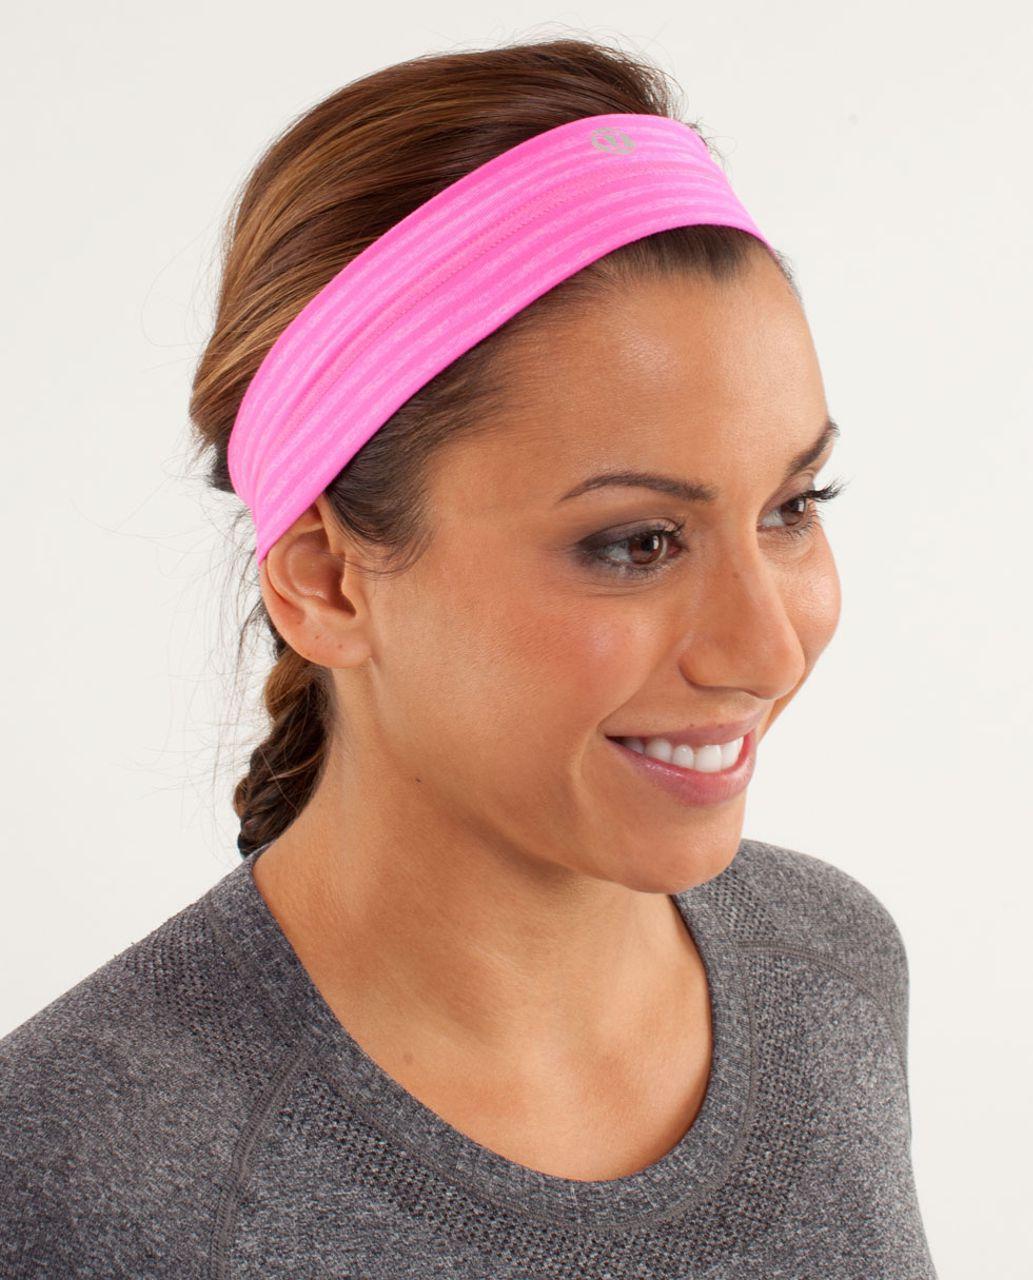 Lululemon Fly Away Tamer Headband - Slope Stripe Raspberry Glo Light Heathered Raspberry Glo Light / Black Swan